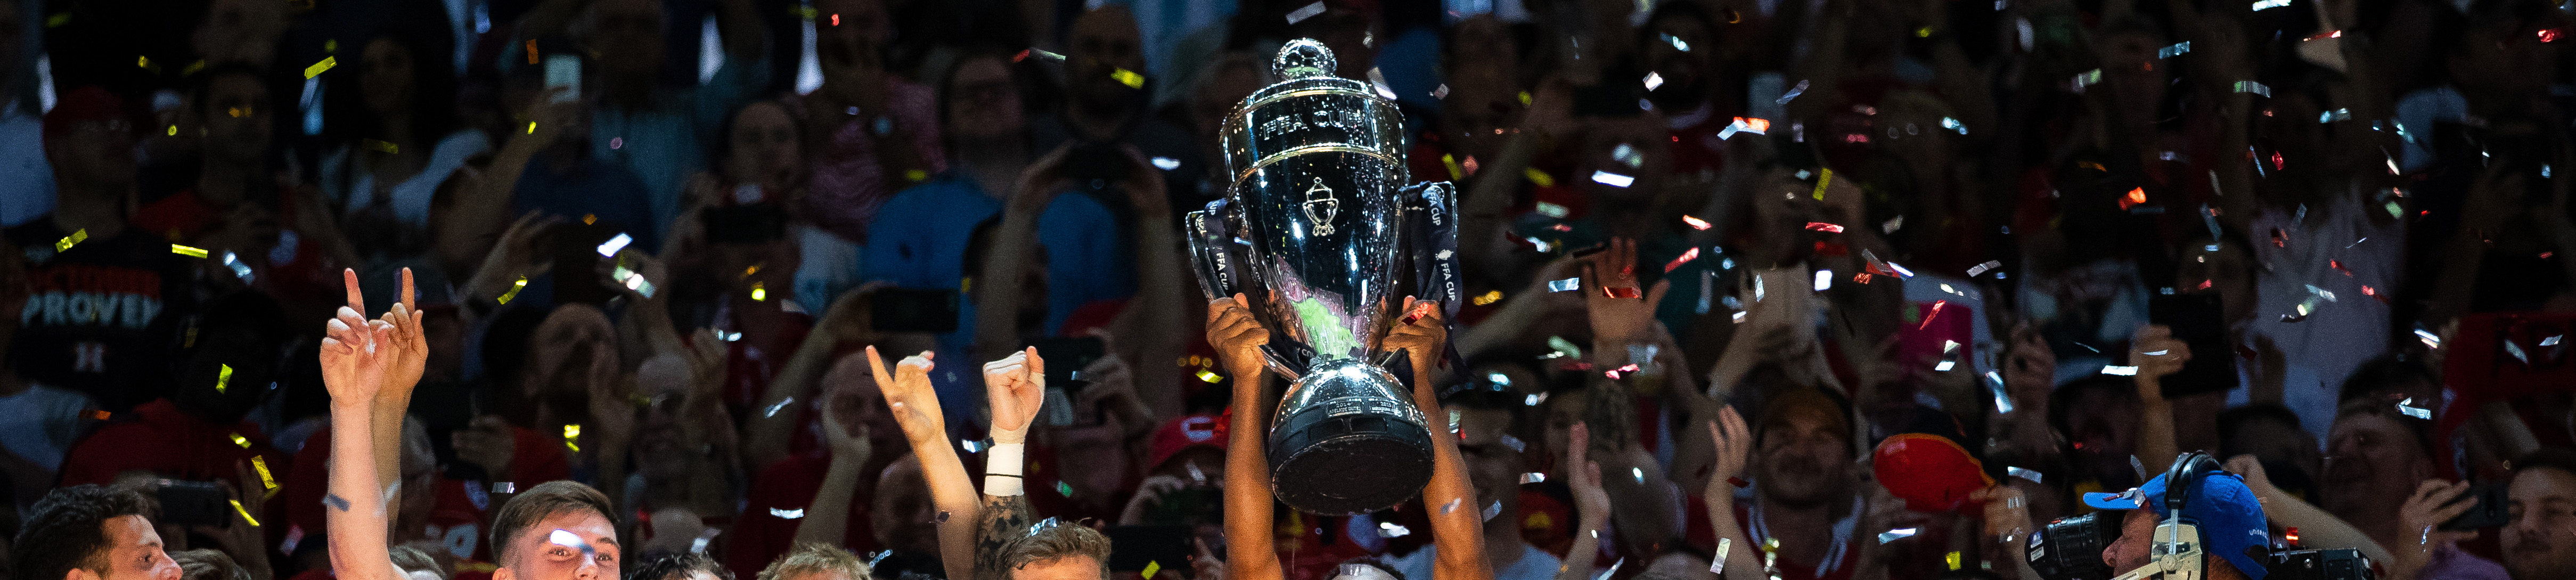 The FFA Cup trophy